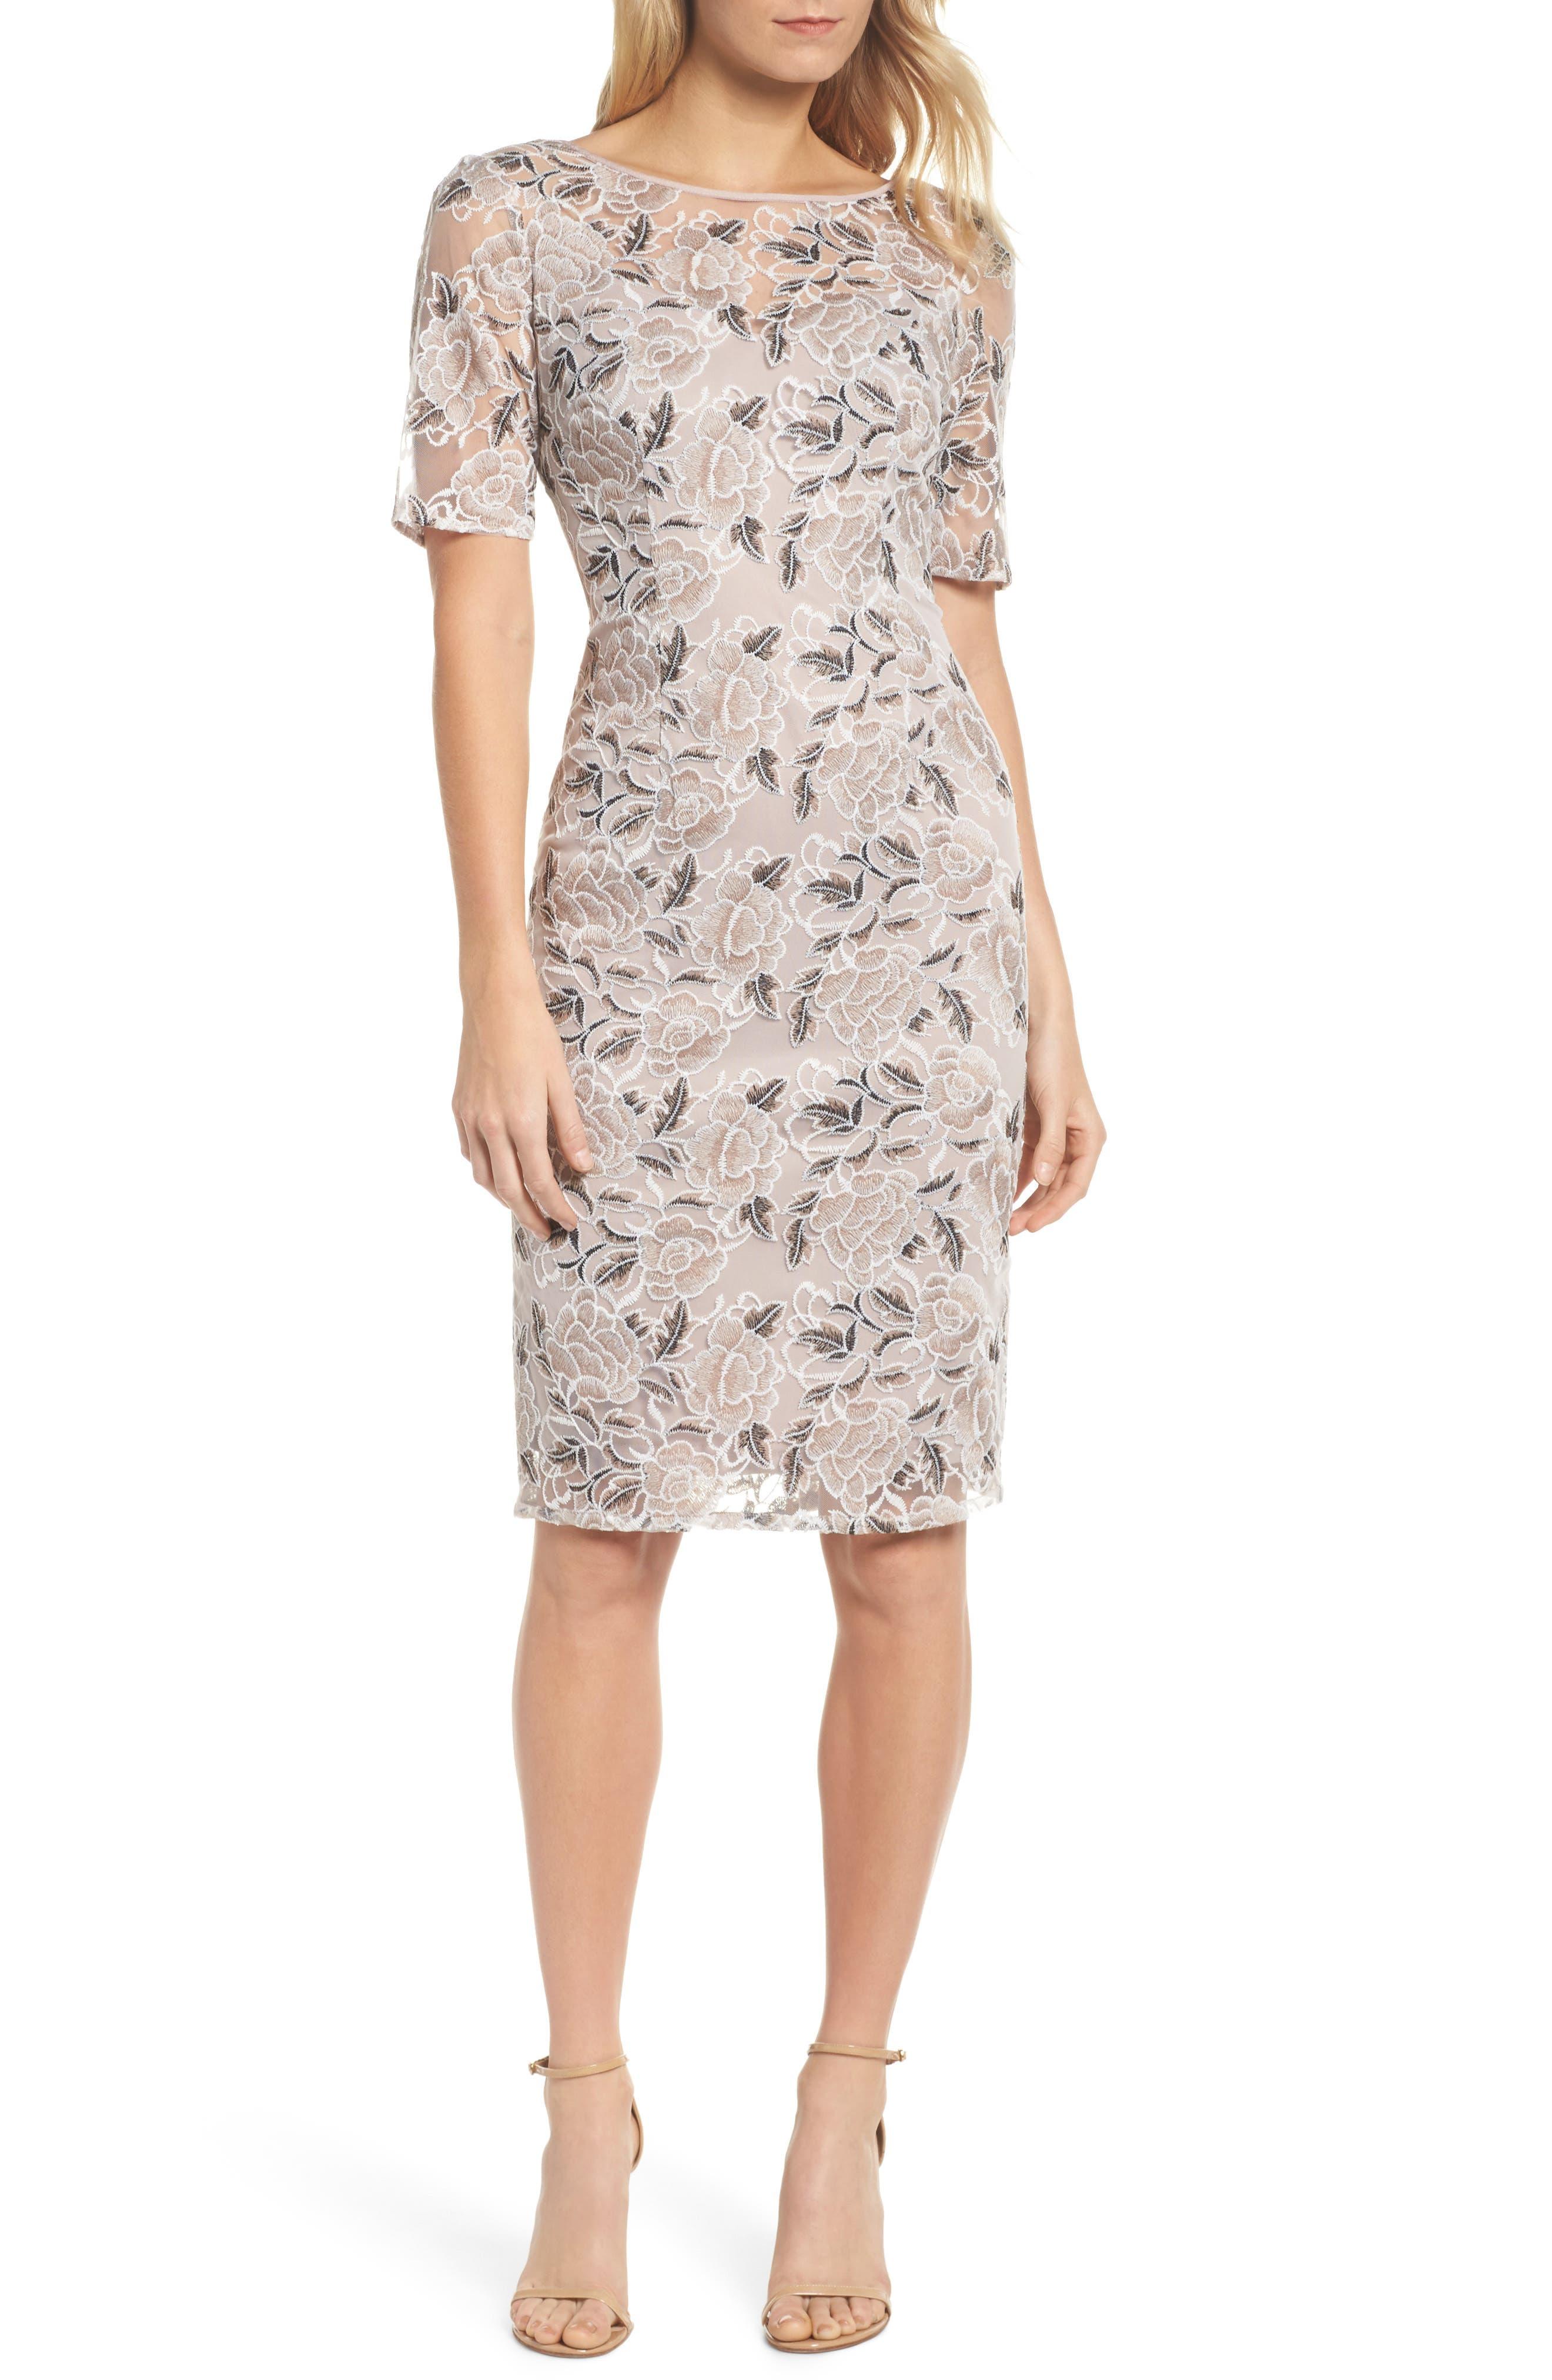 Suzette Embroidered Sheath Dress,                             Main thumbnail 1, color,